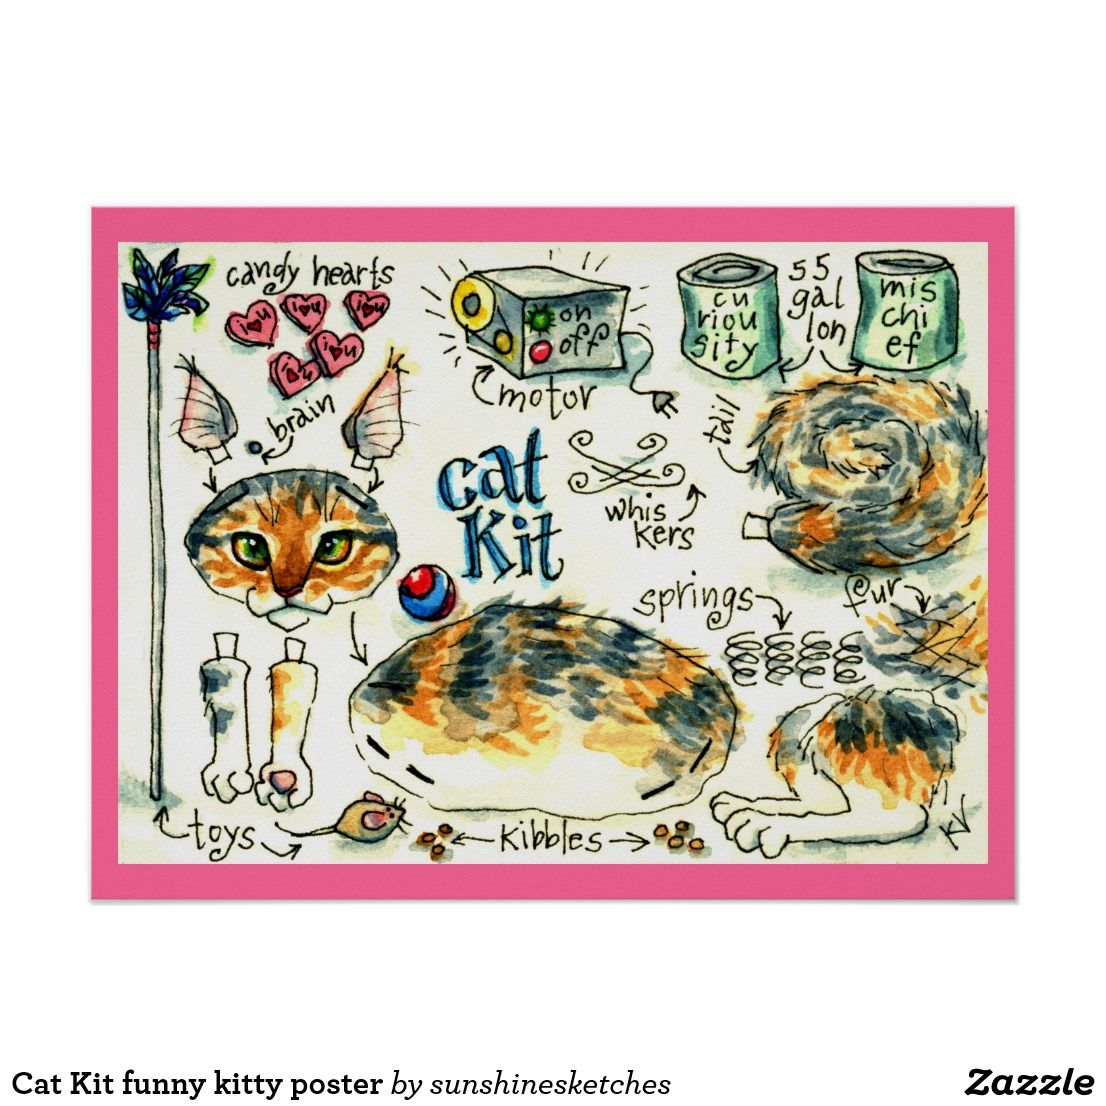 Cat Kit Funny Kitty Poster Zazzle Com Cats Kittens Funny